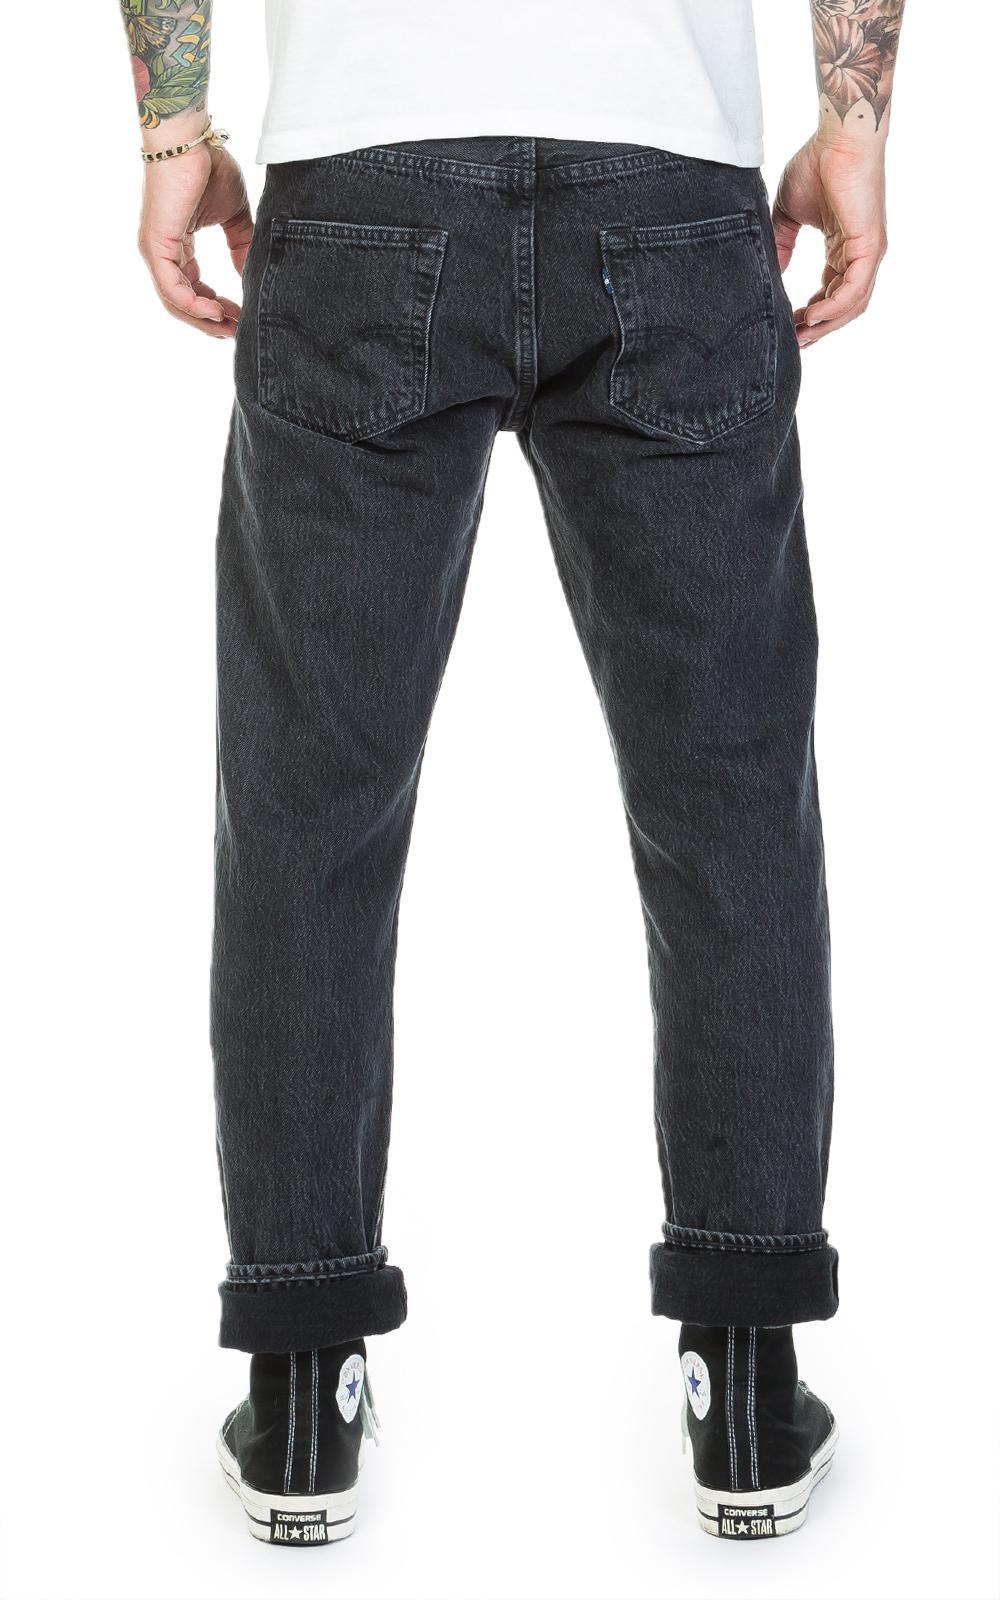 49e65c60e99 Levi s 501 Original Fit Black Stonewash in Black for Men - Lyst